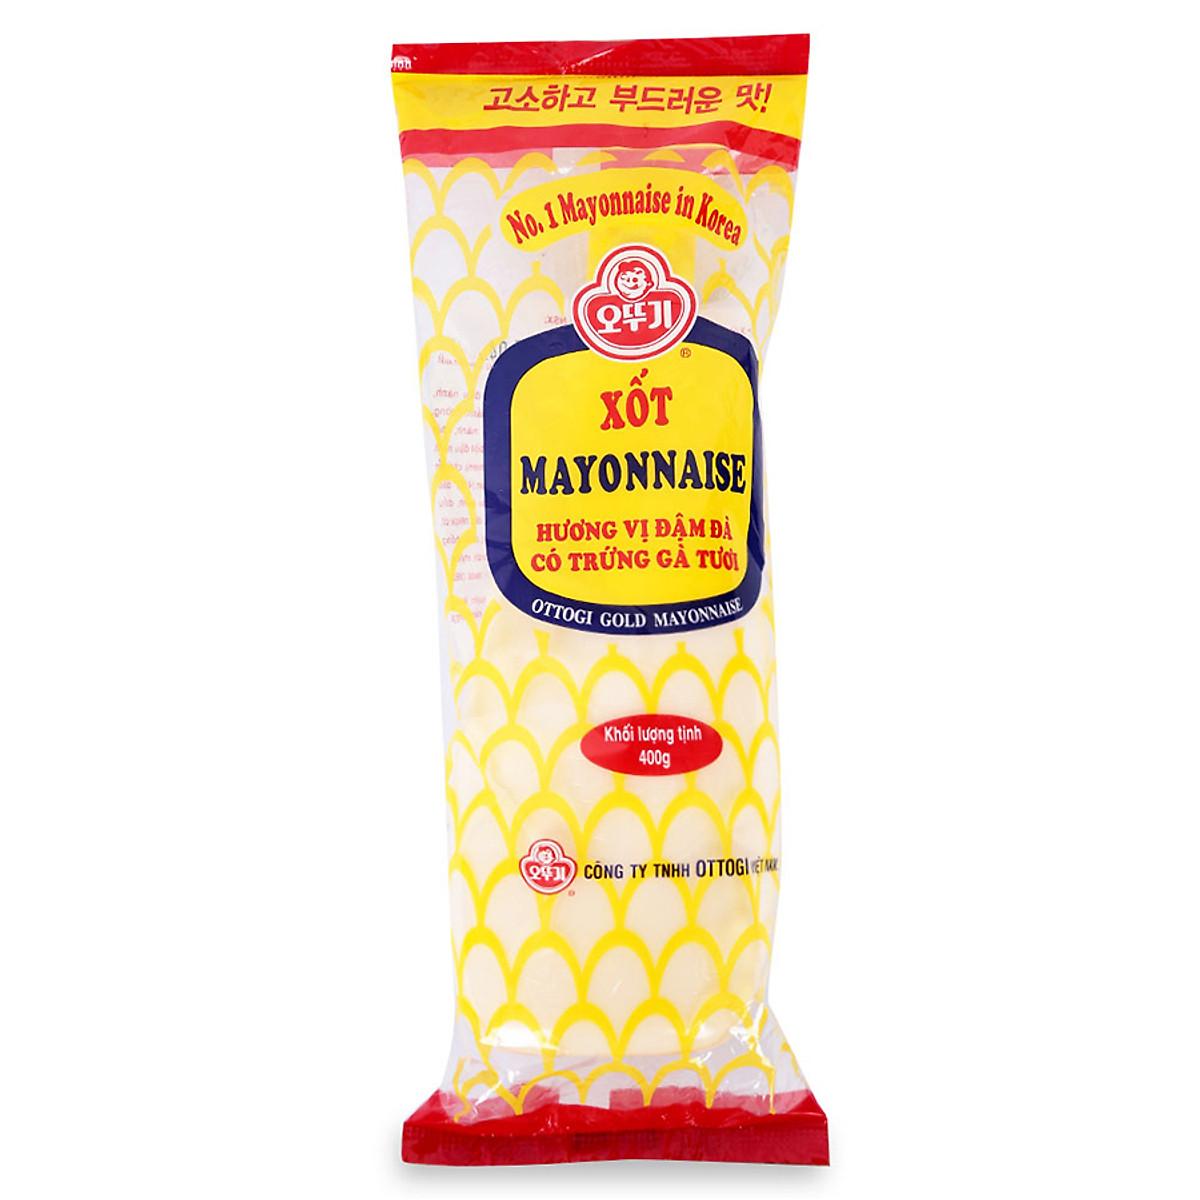 Xốt mayonnaise ottogi 400g